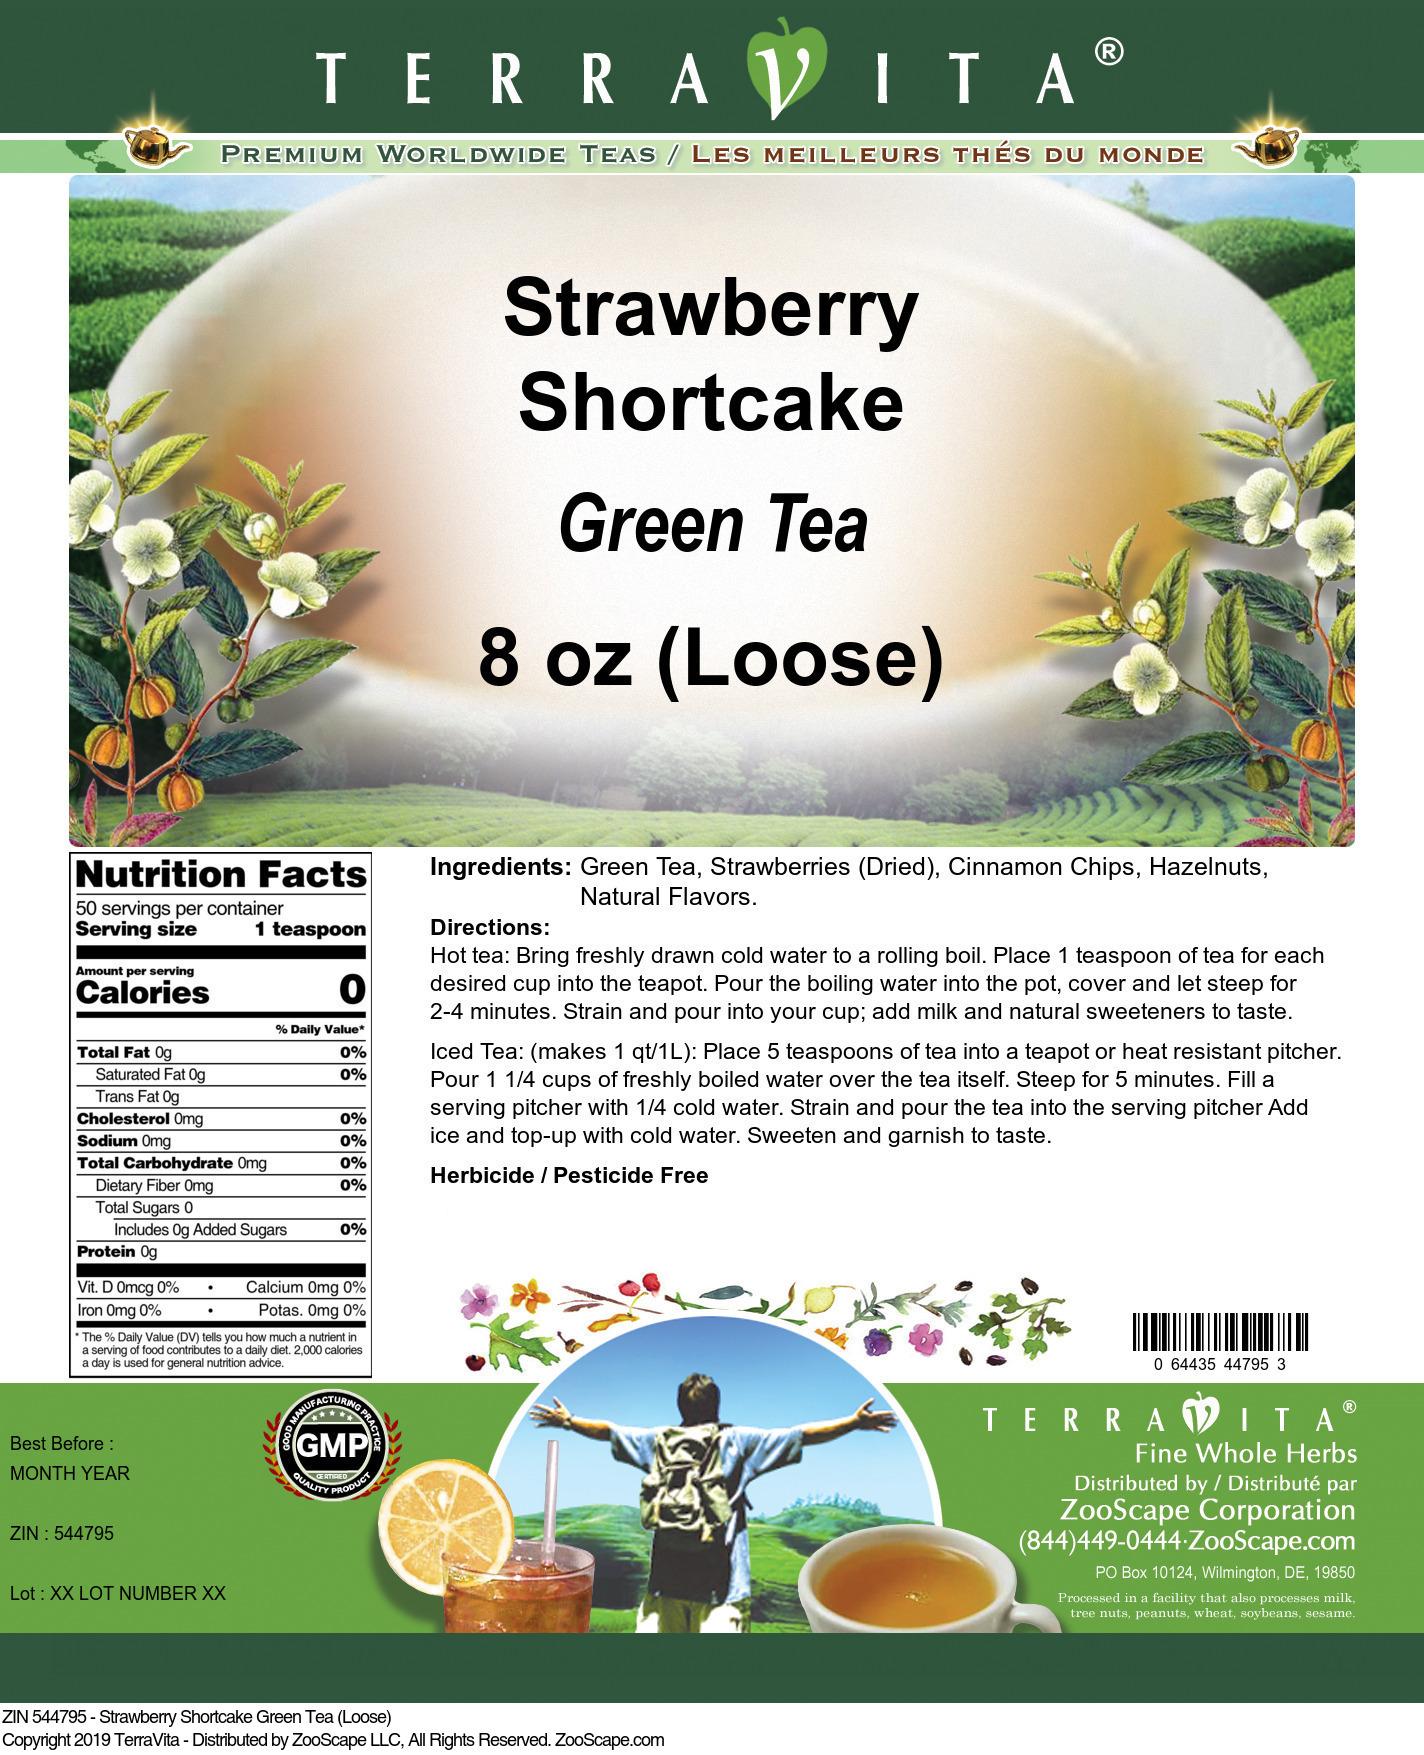 Strawberry Shortcake Green Tea (Loose)